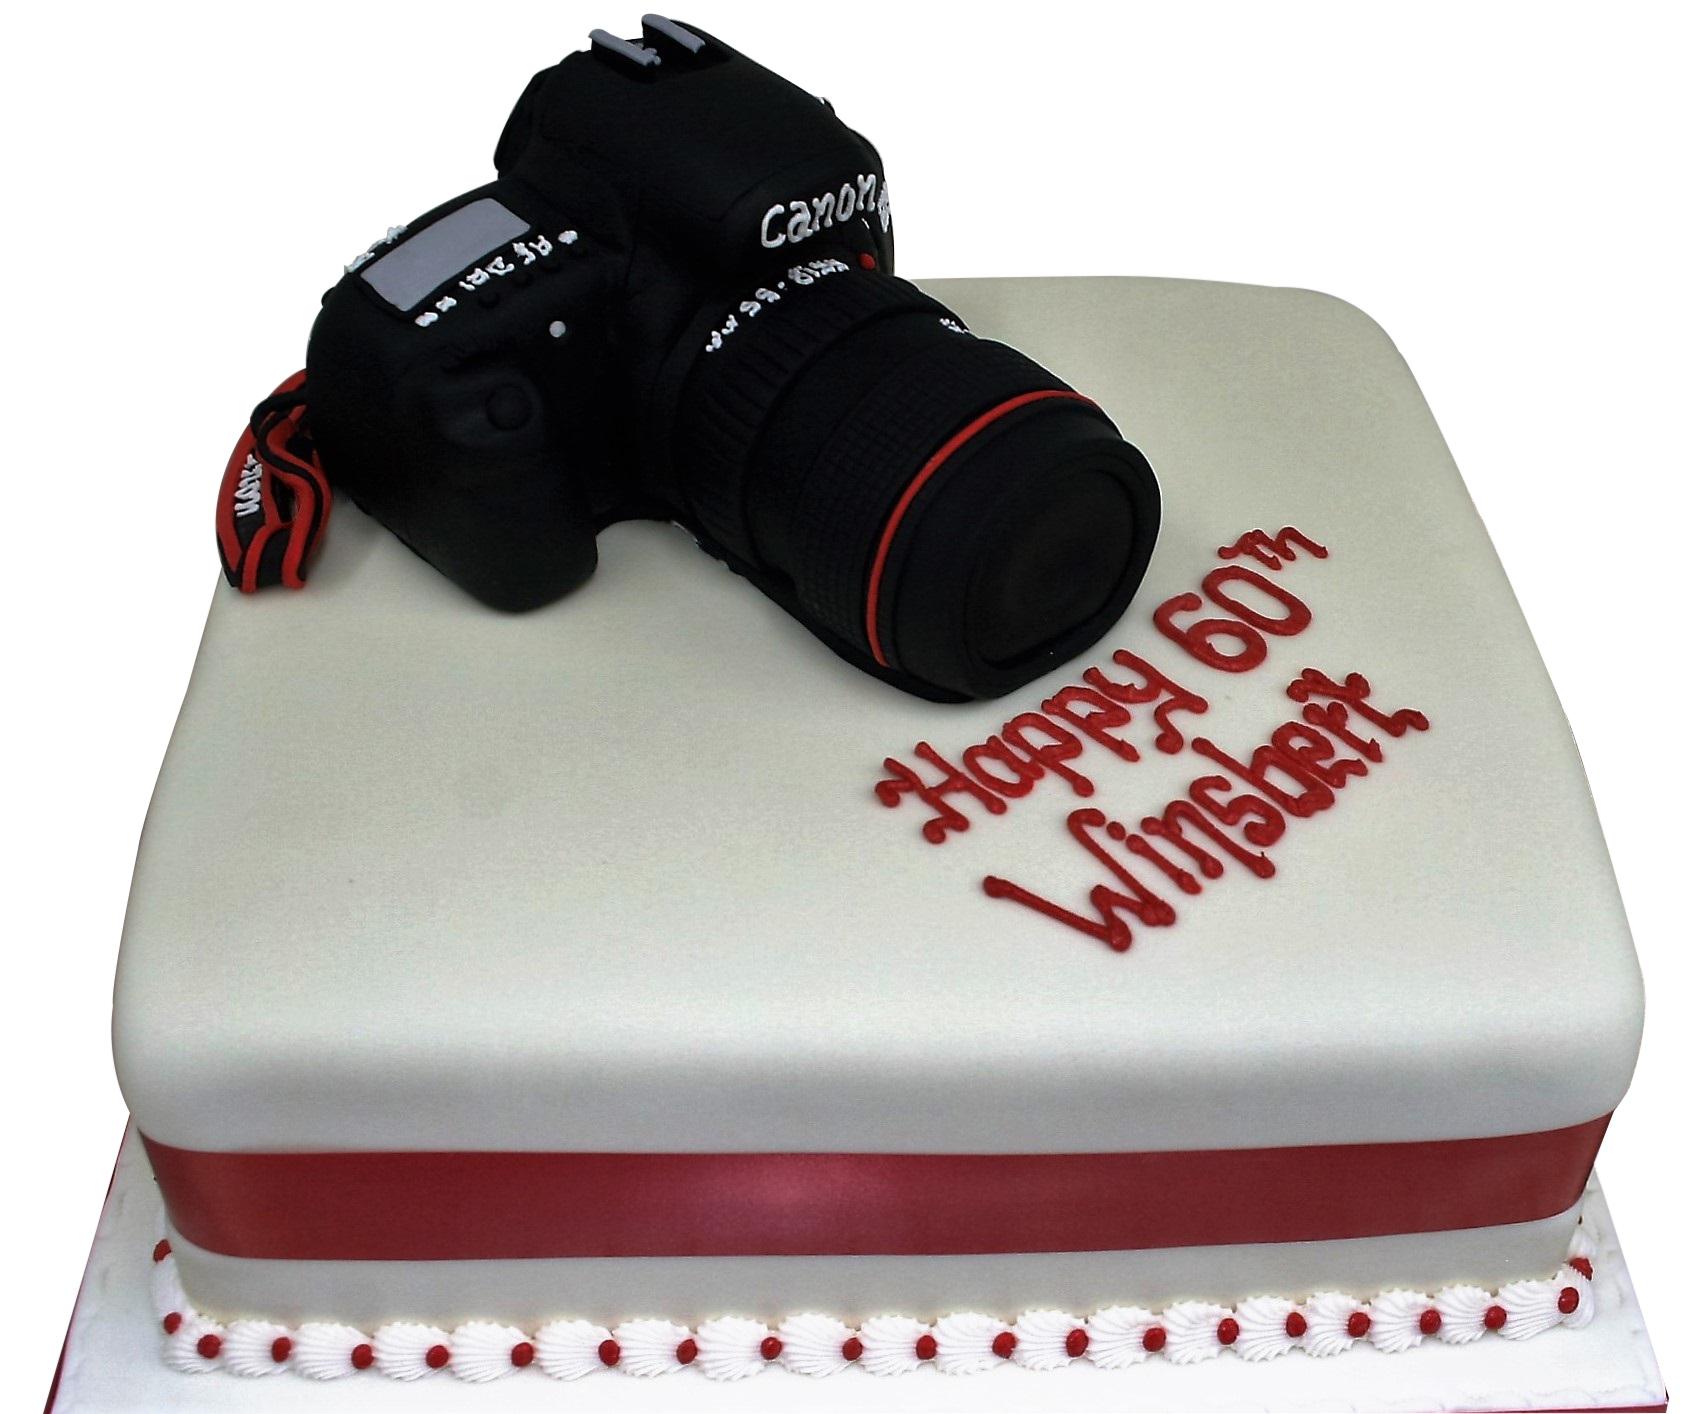 Astounding Camera Birthday Cake Eggless Gluten Free Cake Free Uk Delivery Funny Birthday Cards Online Benoljebrpdamsfinfo